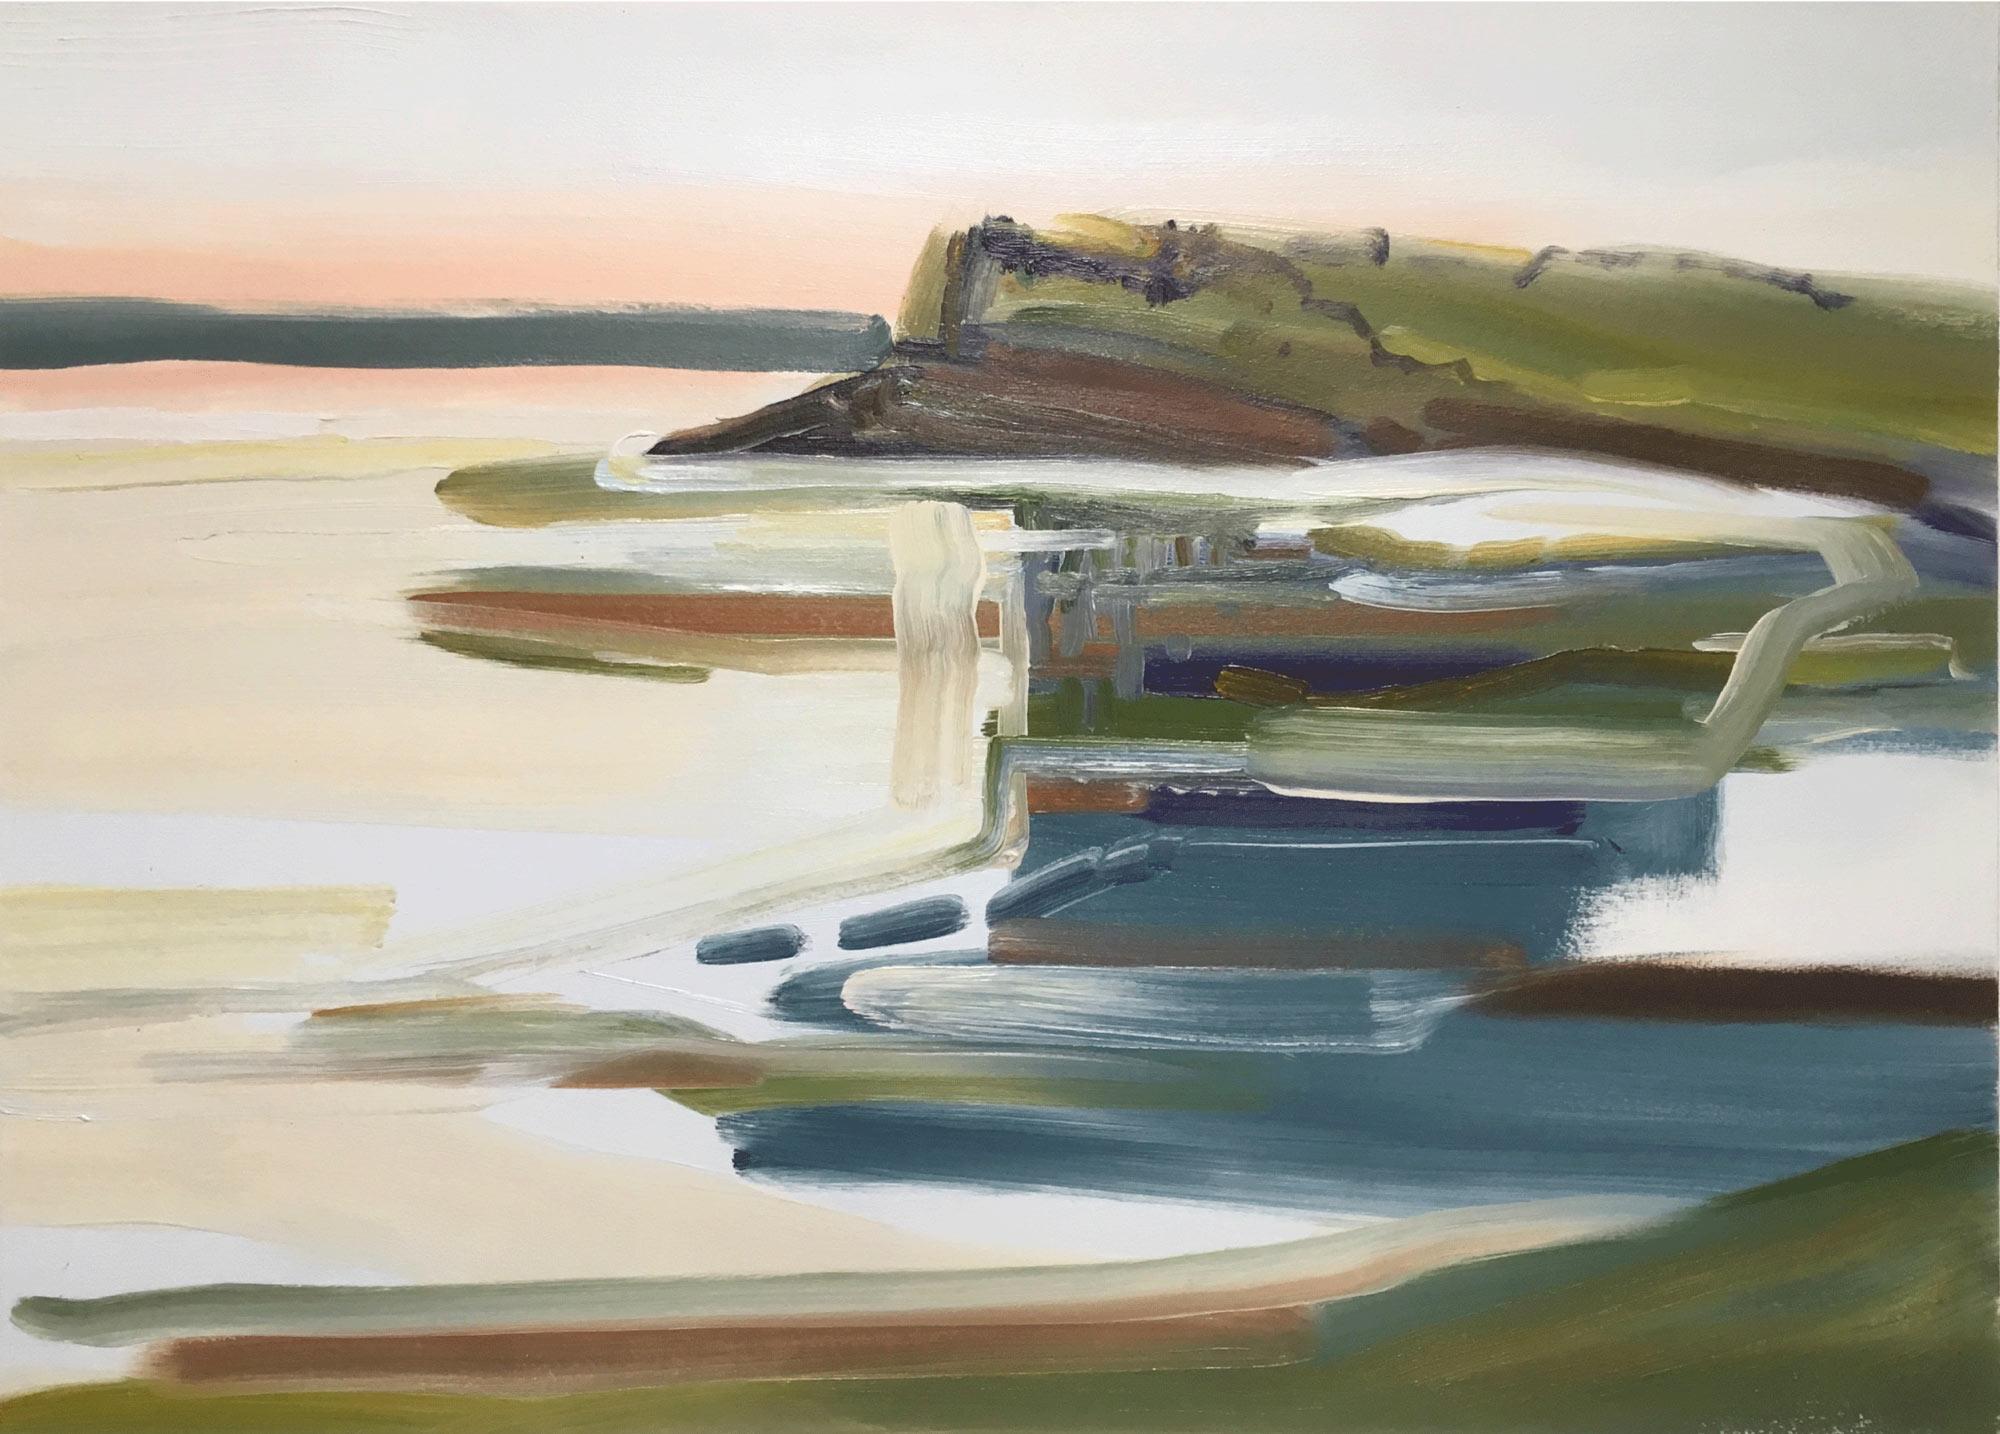 Copy of #7, a painting of the New Brunswick coast by Thomas Joseph